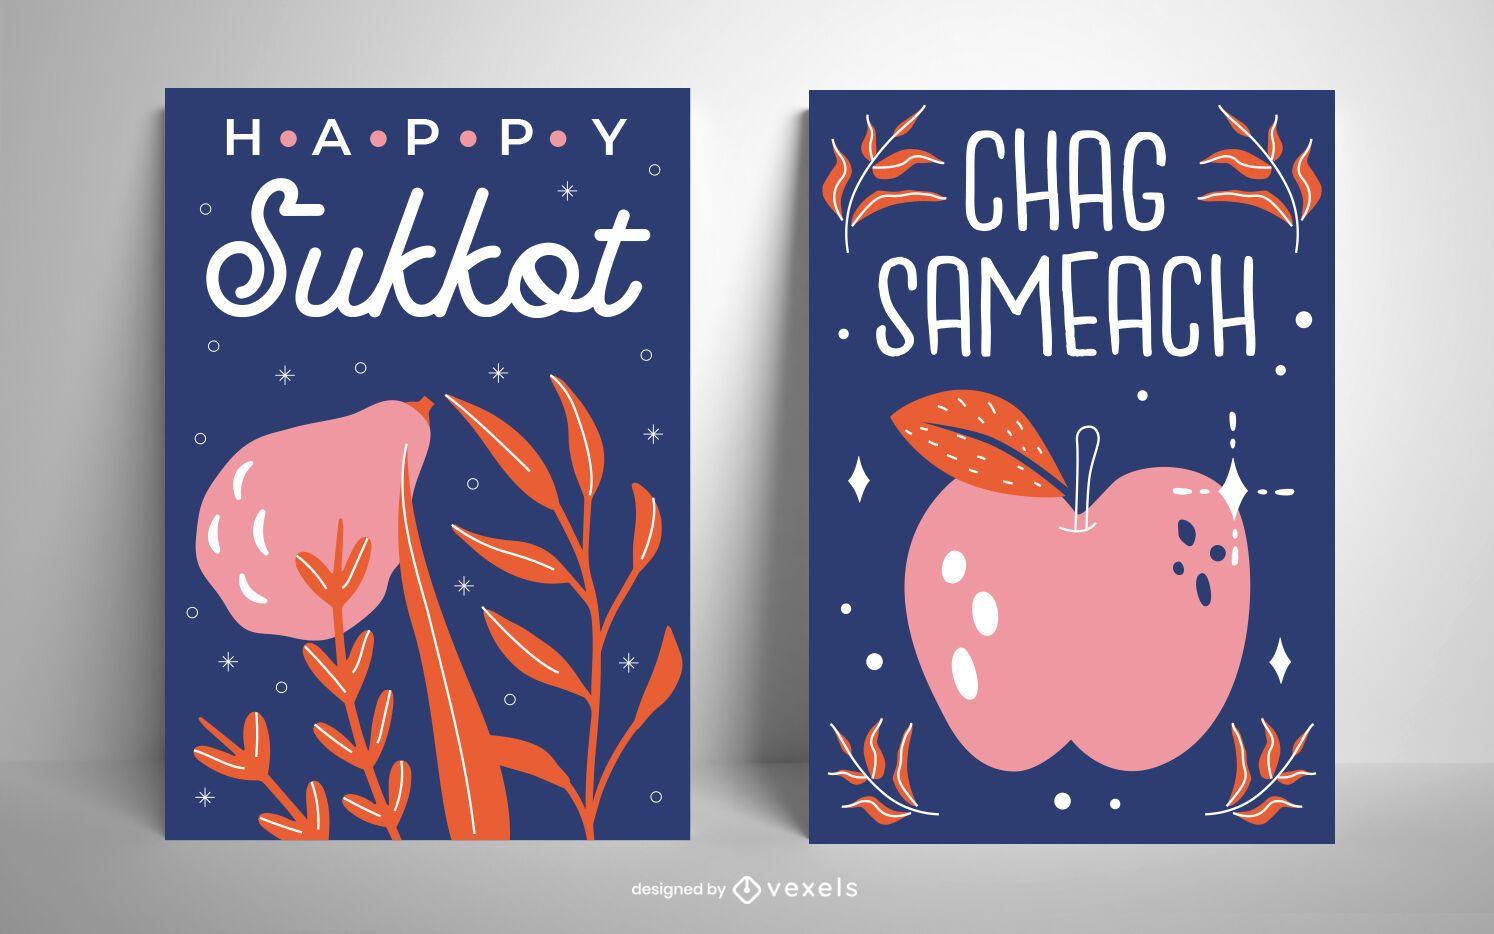 Conjunto de diseño de tarjeta Chag Sameach